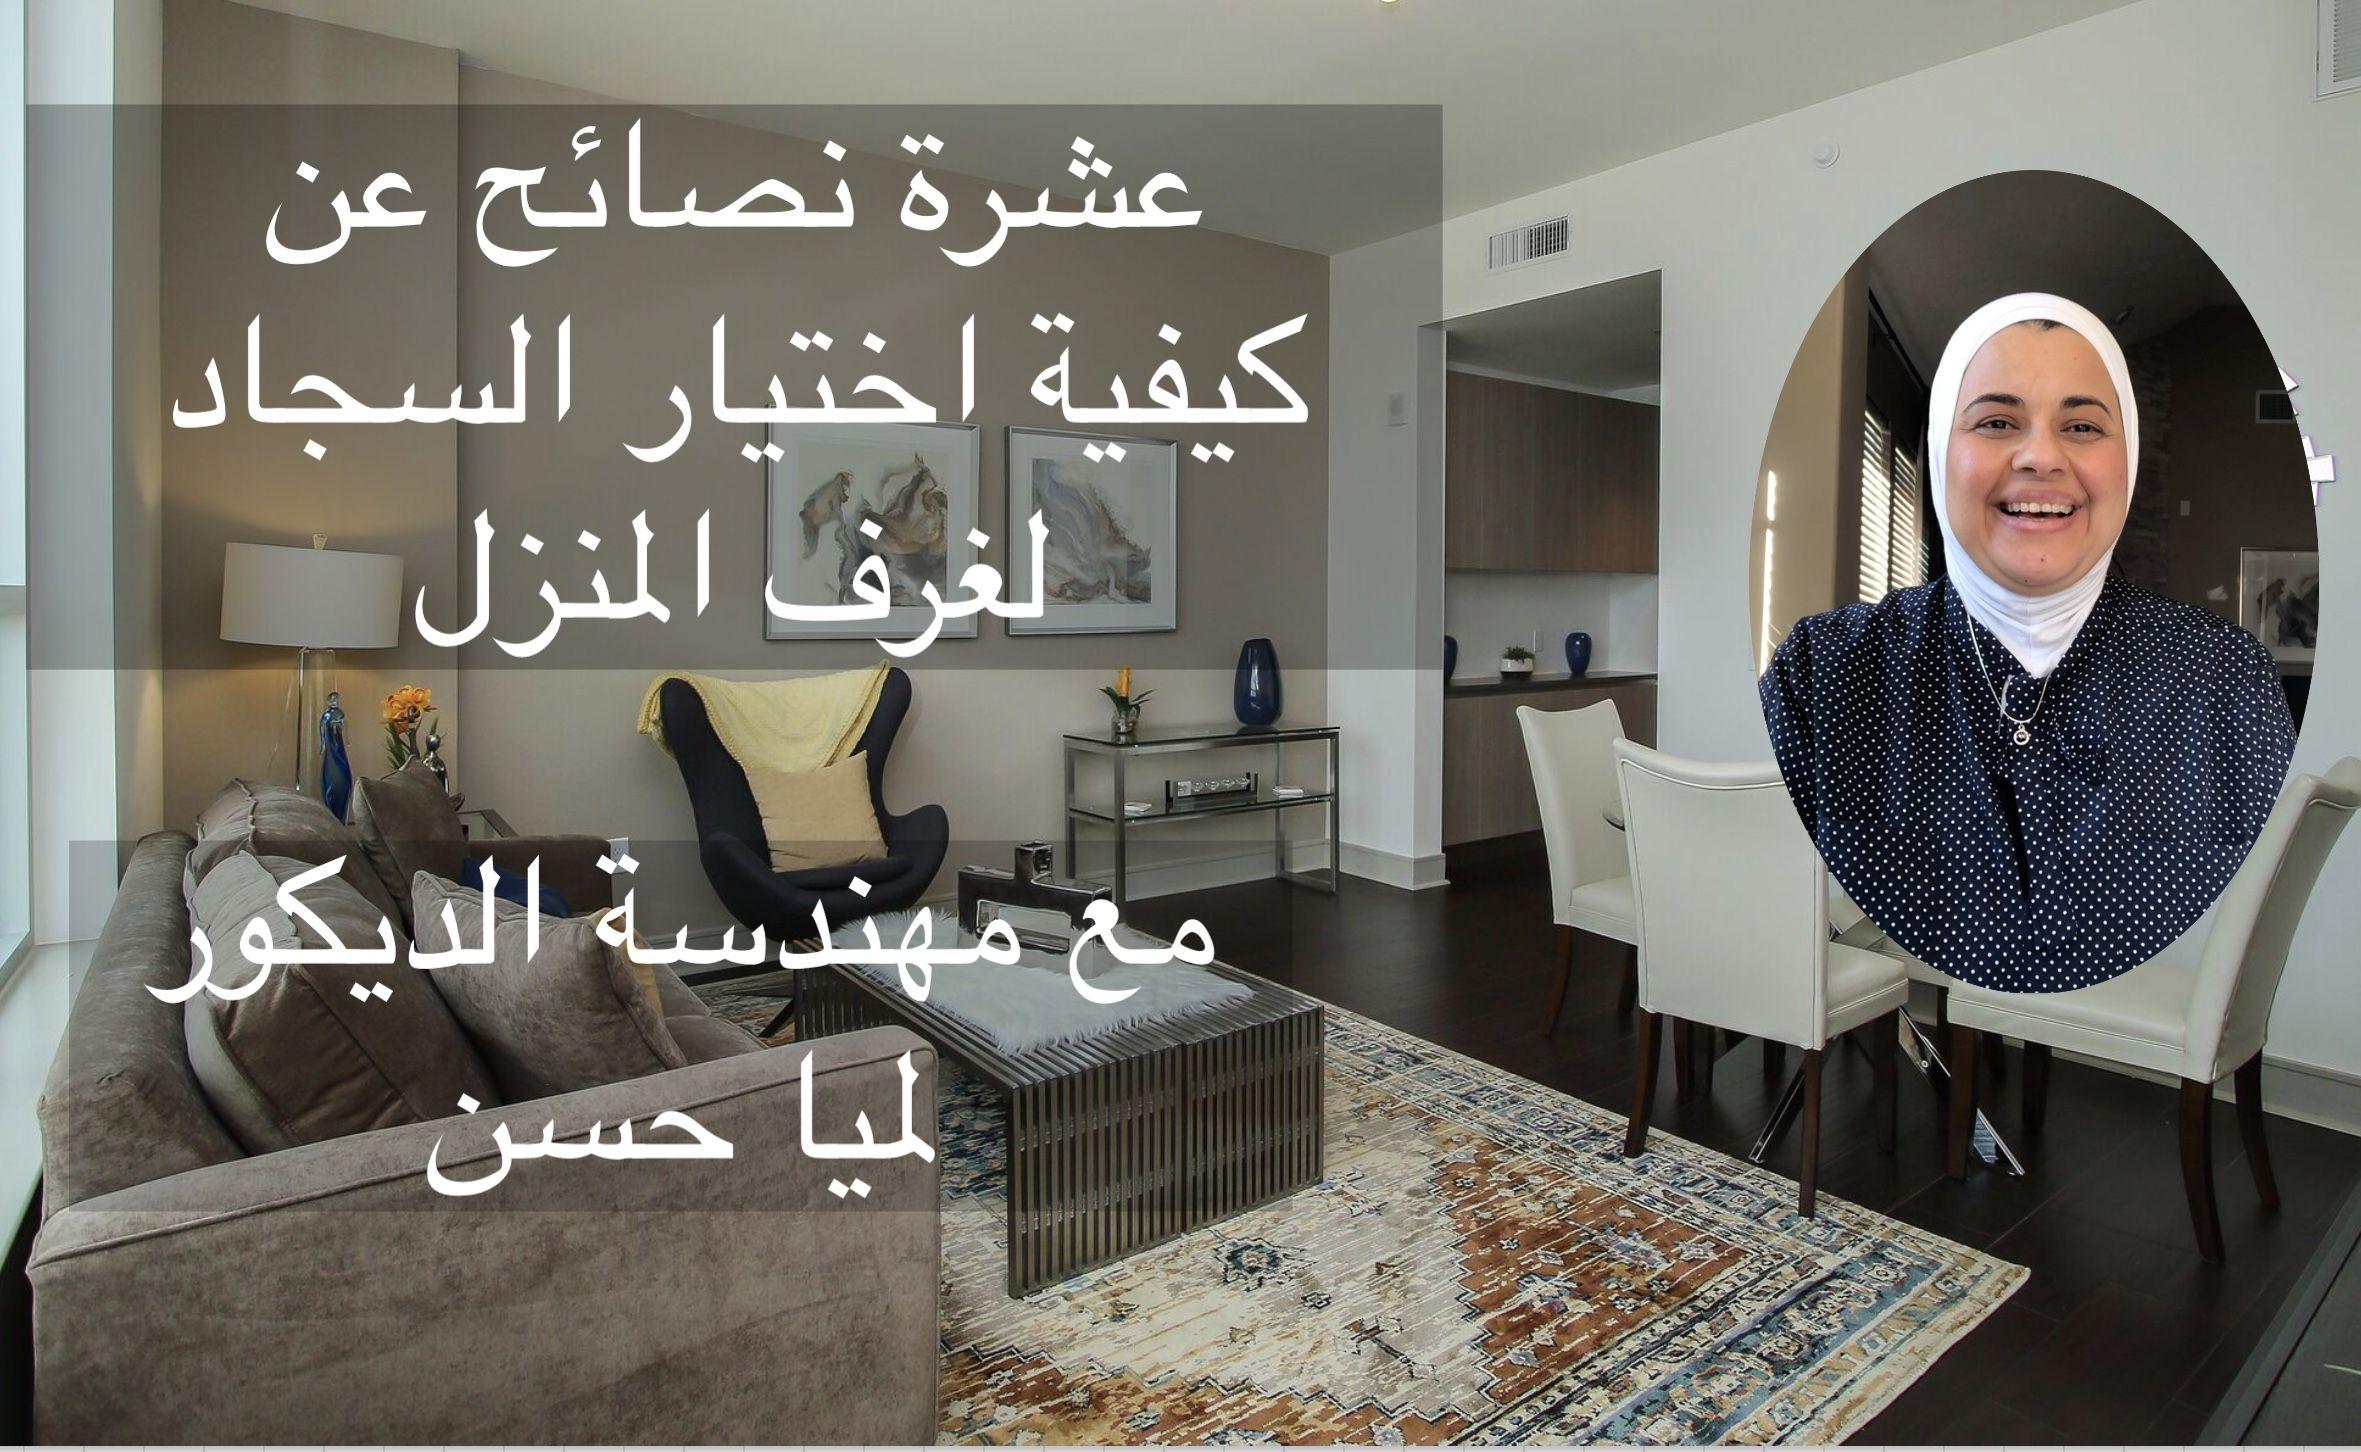 نصائح اختيار سجاد المنزل Home Decor Decals Home Decor Home N Decor